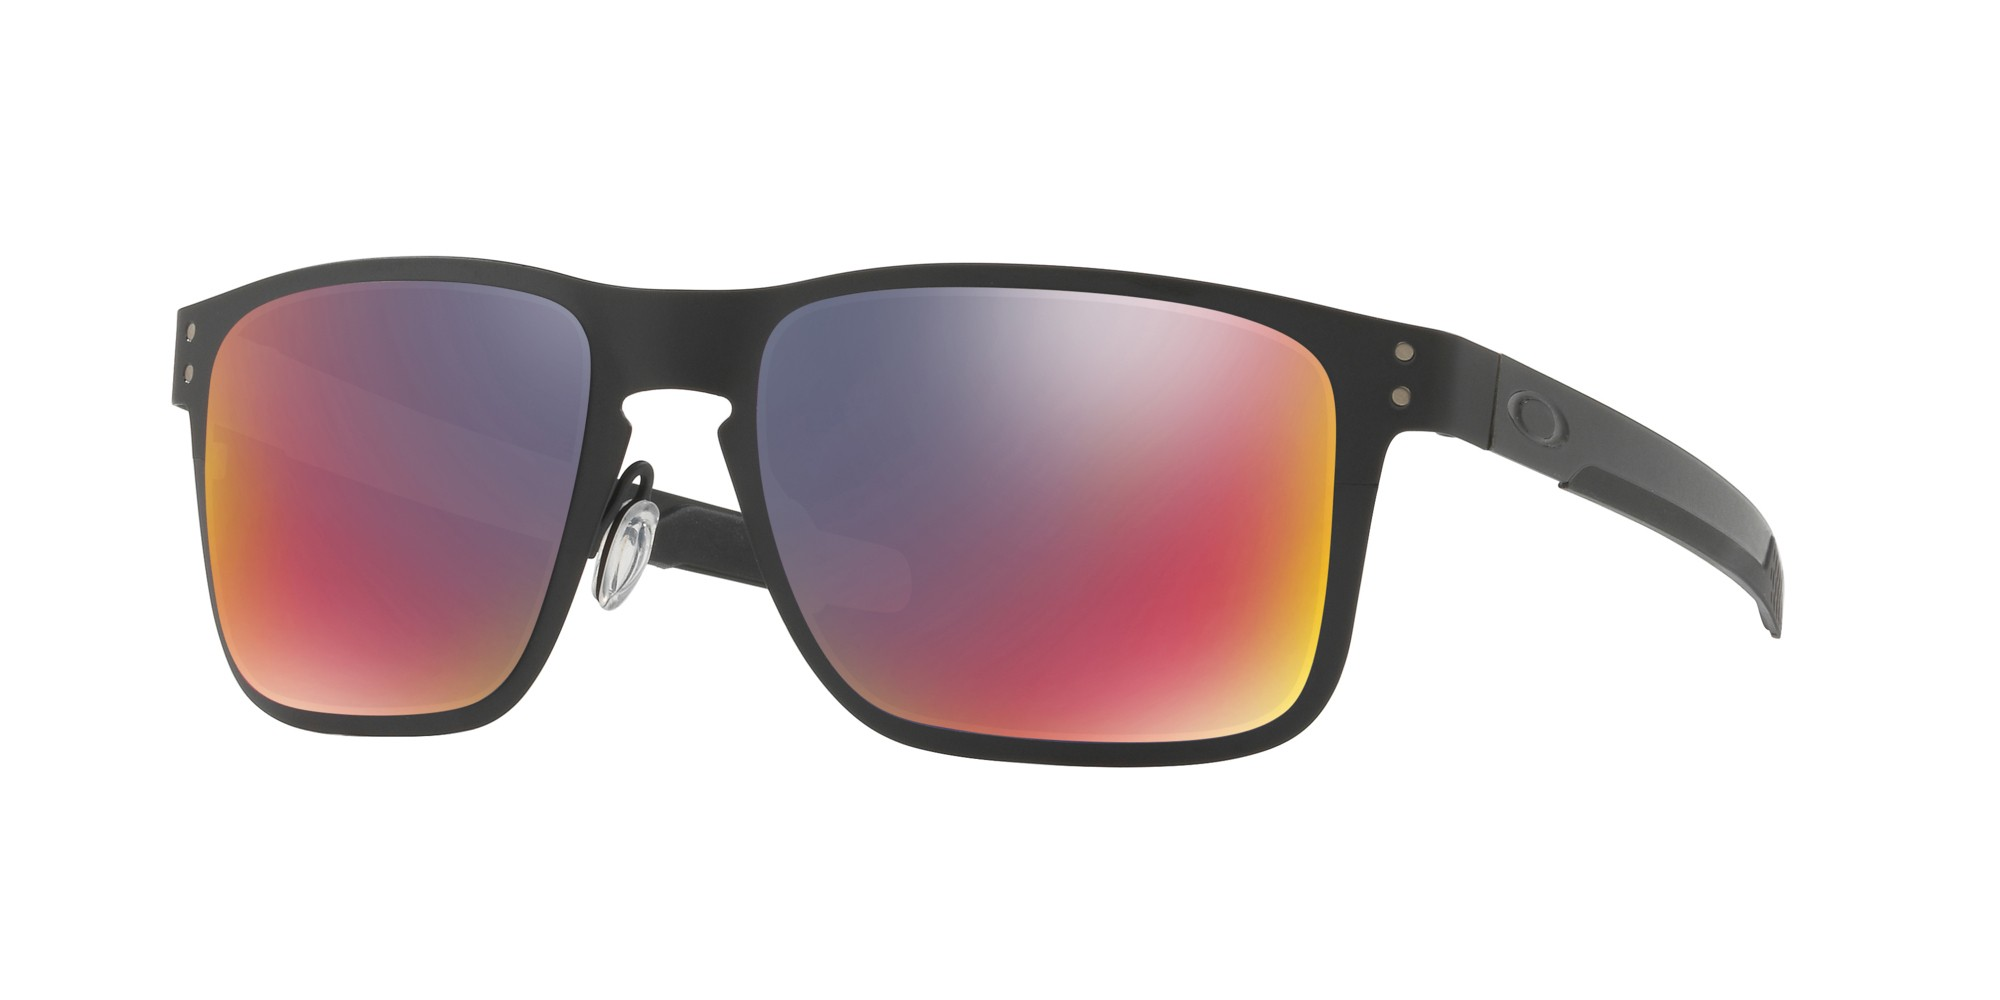 37a01d9006b Authentic Oakley Holbrook Metal Prescription Sunglasses